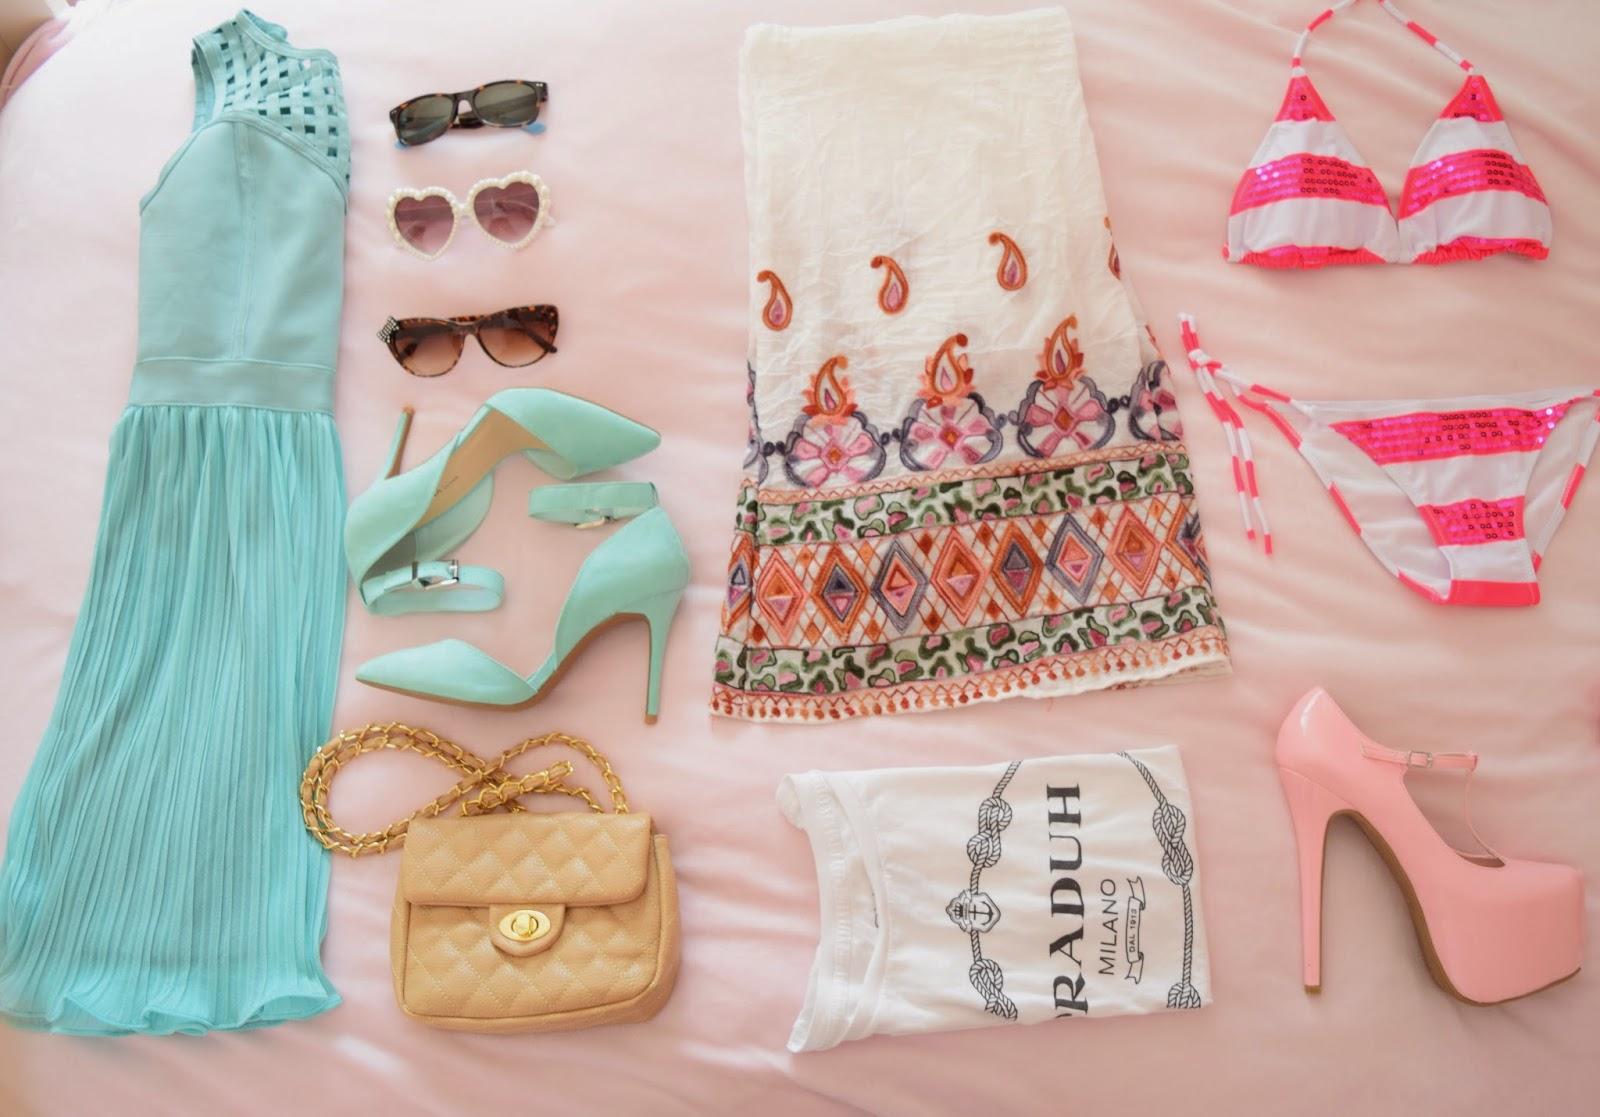 miami fashion week, bikini, sunglasses, high heels, accessories, girly